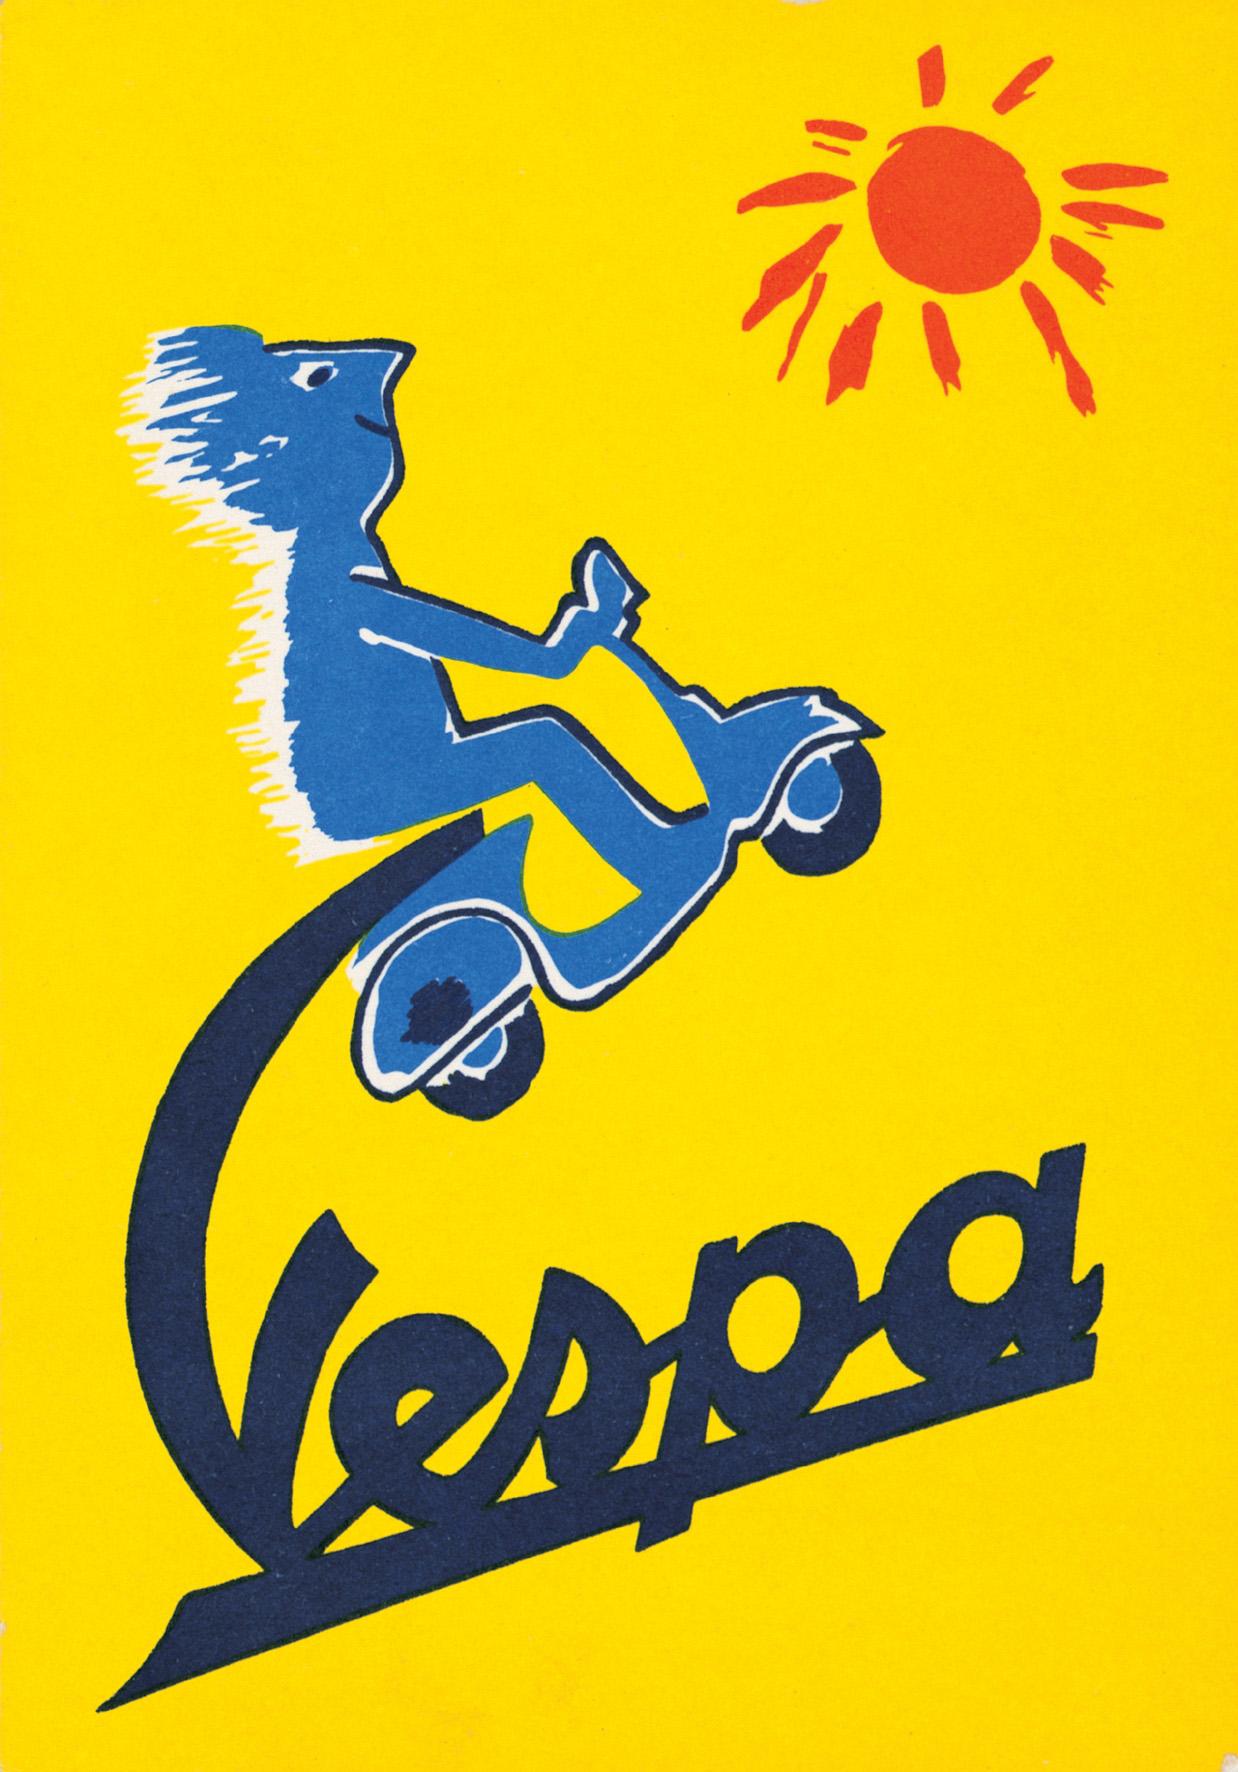 Vespa Vintage Ads | Classic Motorbikes